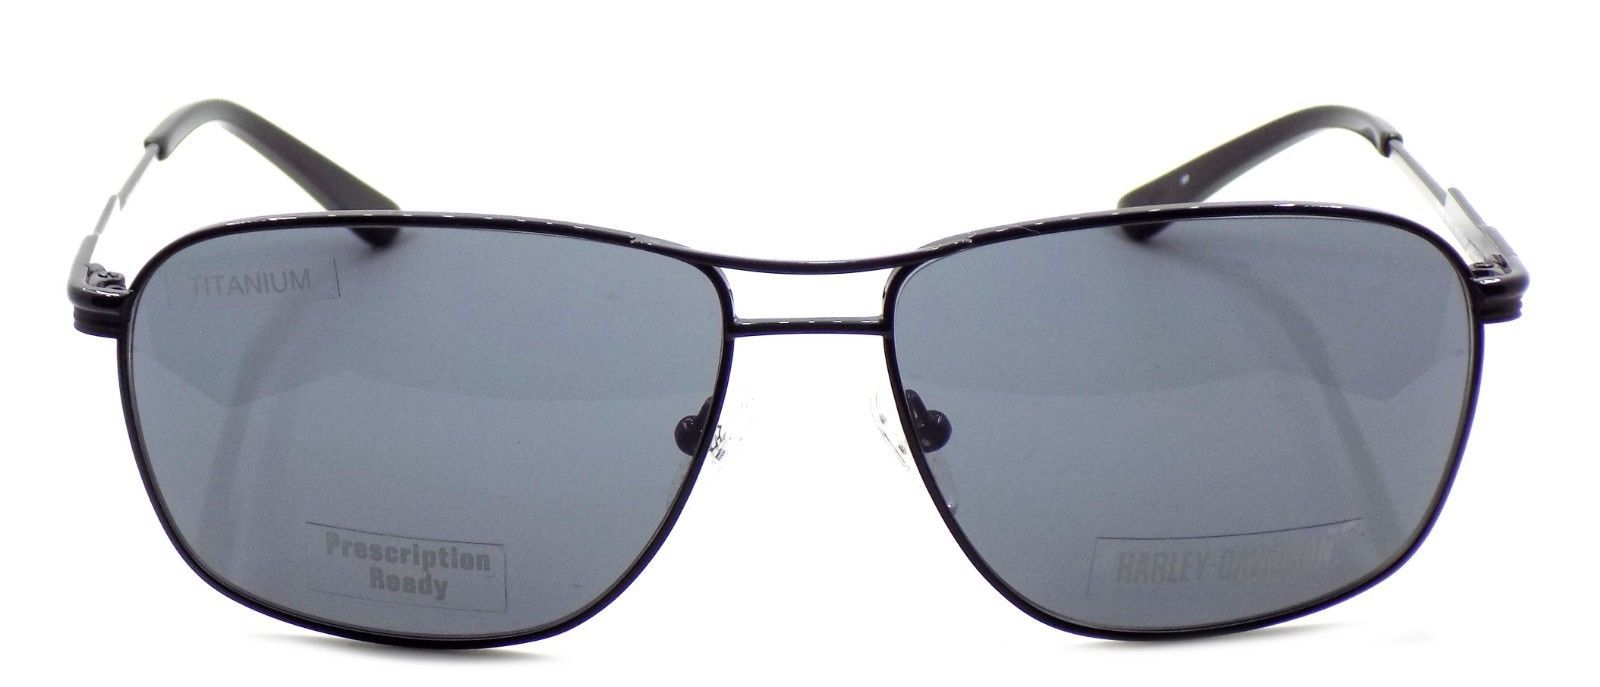 Harley Davidson HDX876 BLK-3 Aviator Sunglasses TITANIUM Black 59-15-140 Smoke